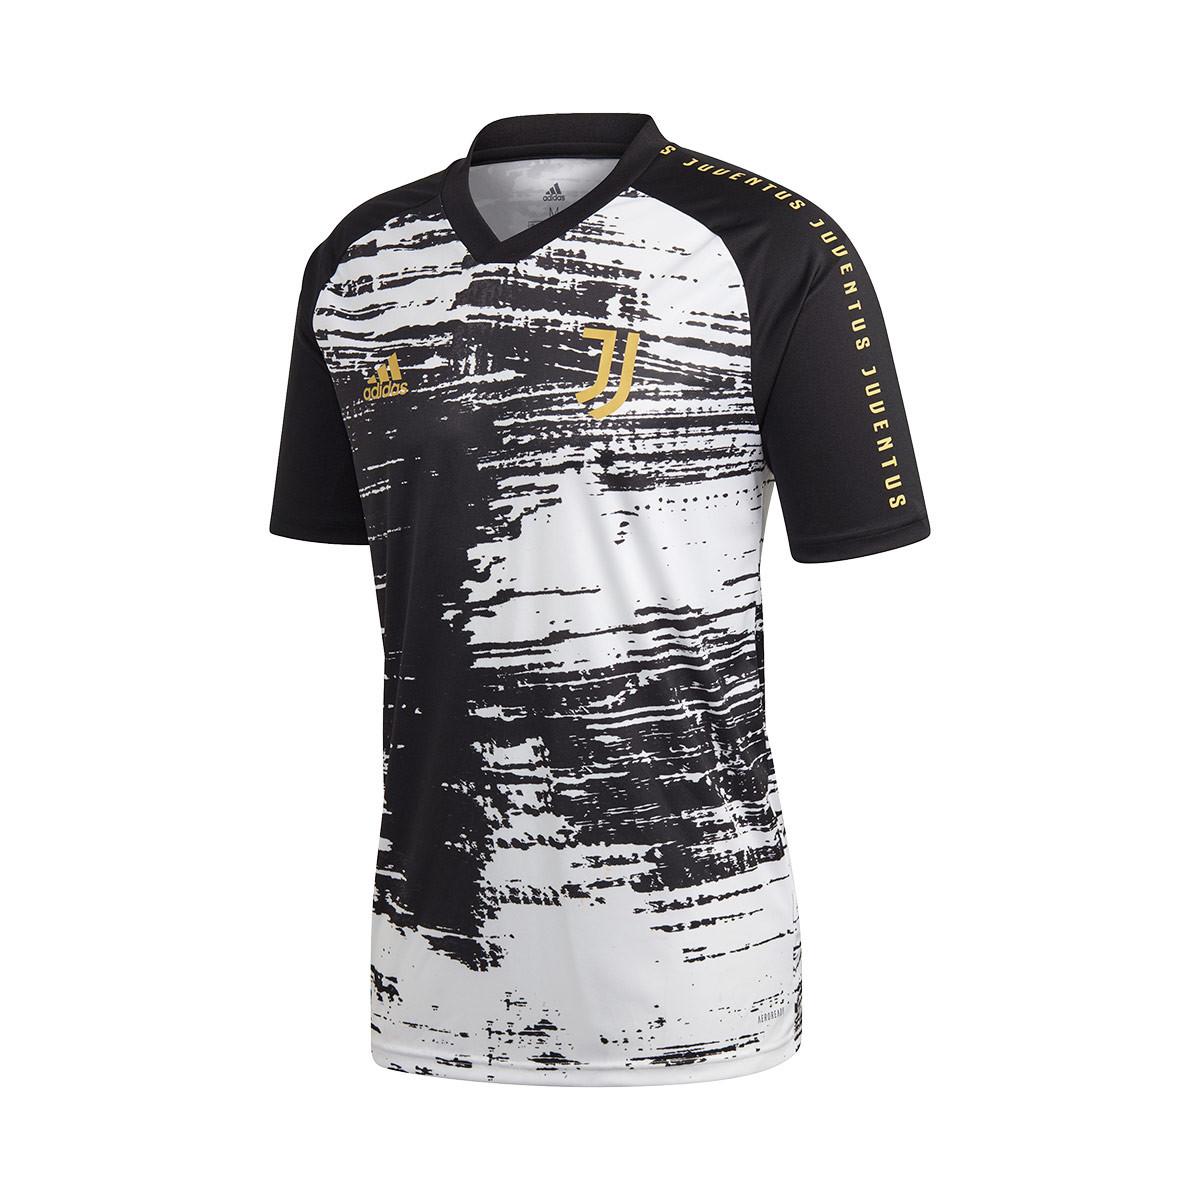 jersey adidas juventus pre match 2020 2021 white black football store futbol emotion adidas juventus pre match 2020 2021 jersey